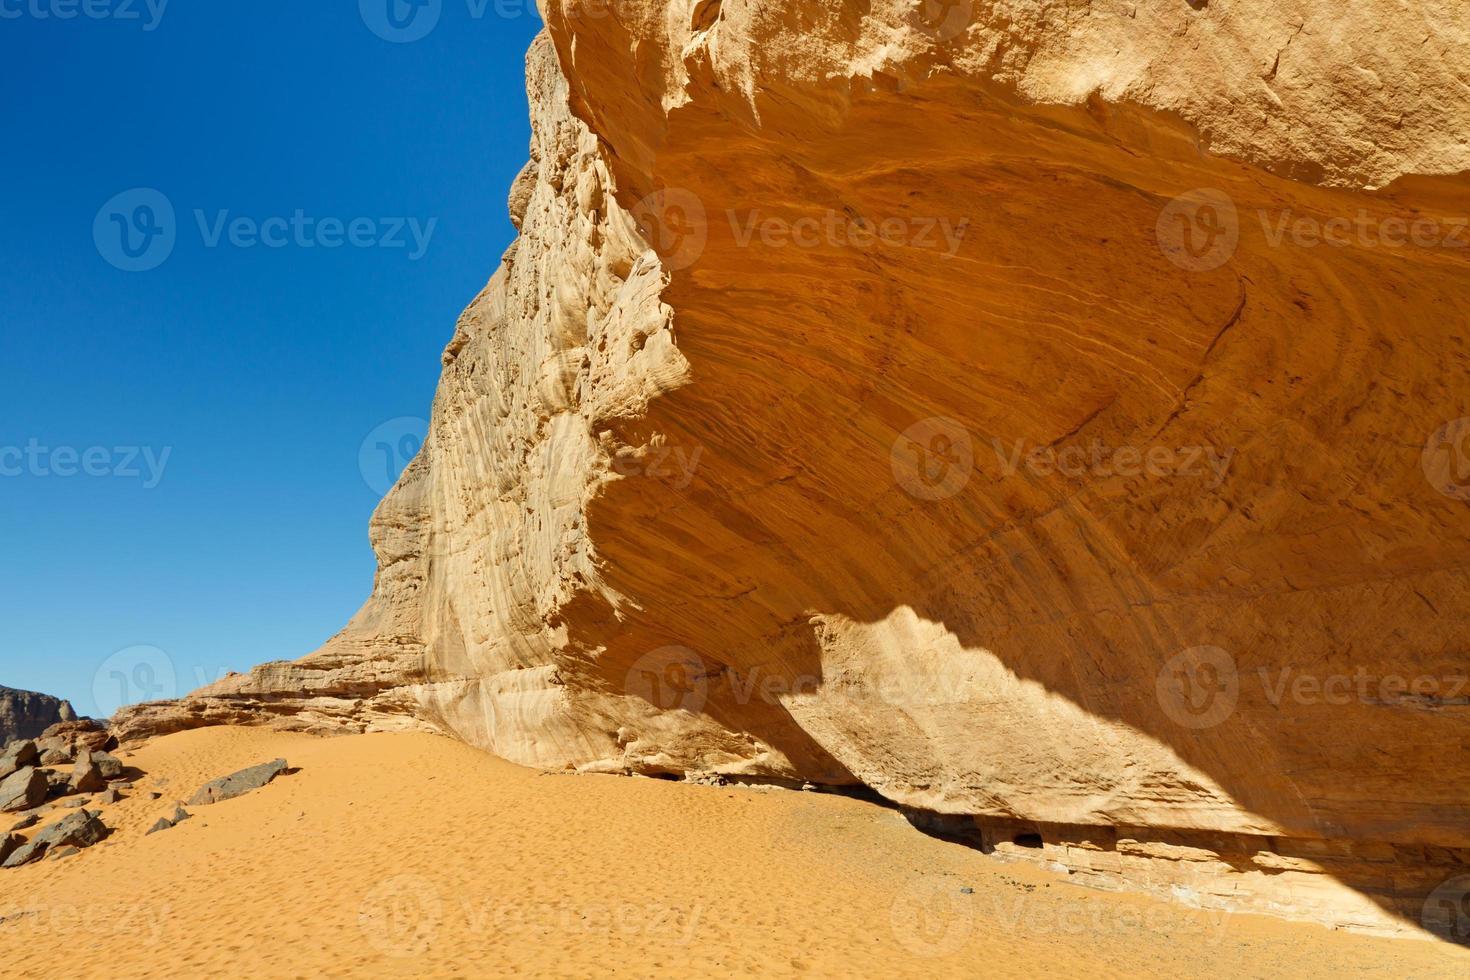 Massive Rock Face in the Sahara Desert photo